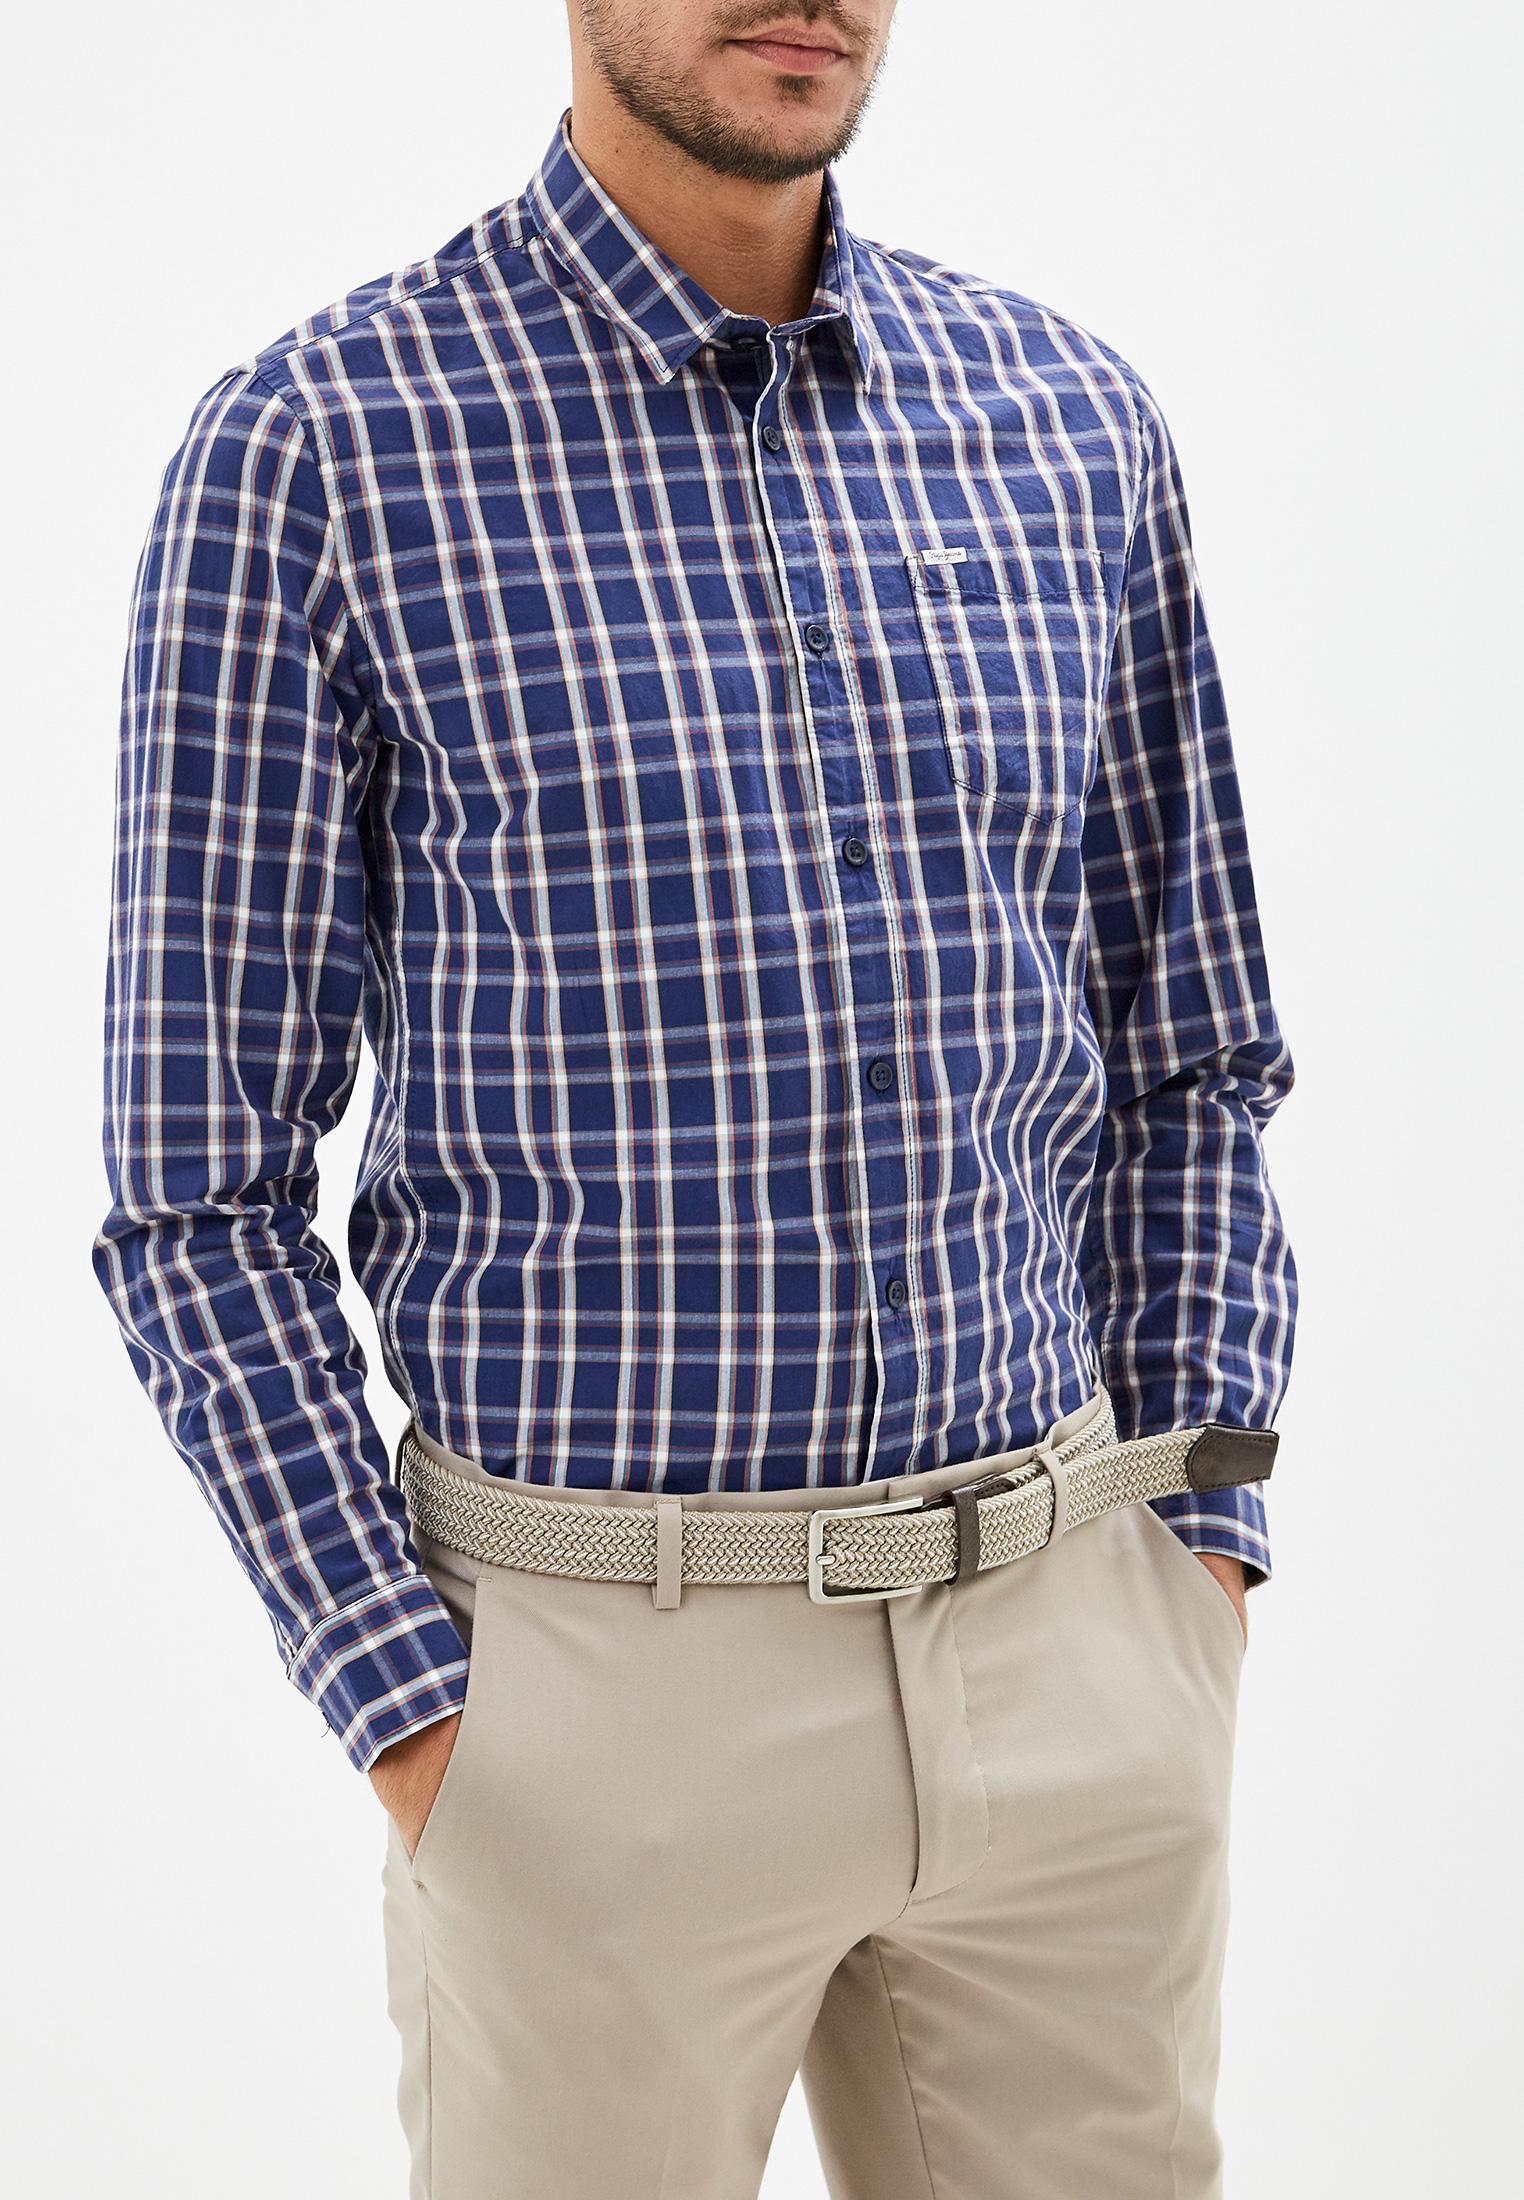 Рубашка с длинным рукавом Pepe Jeans (Пепе Джинс) PM305893